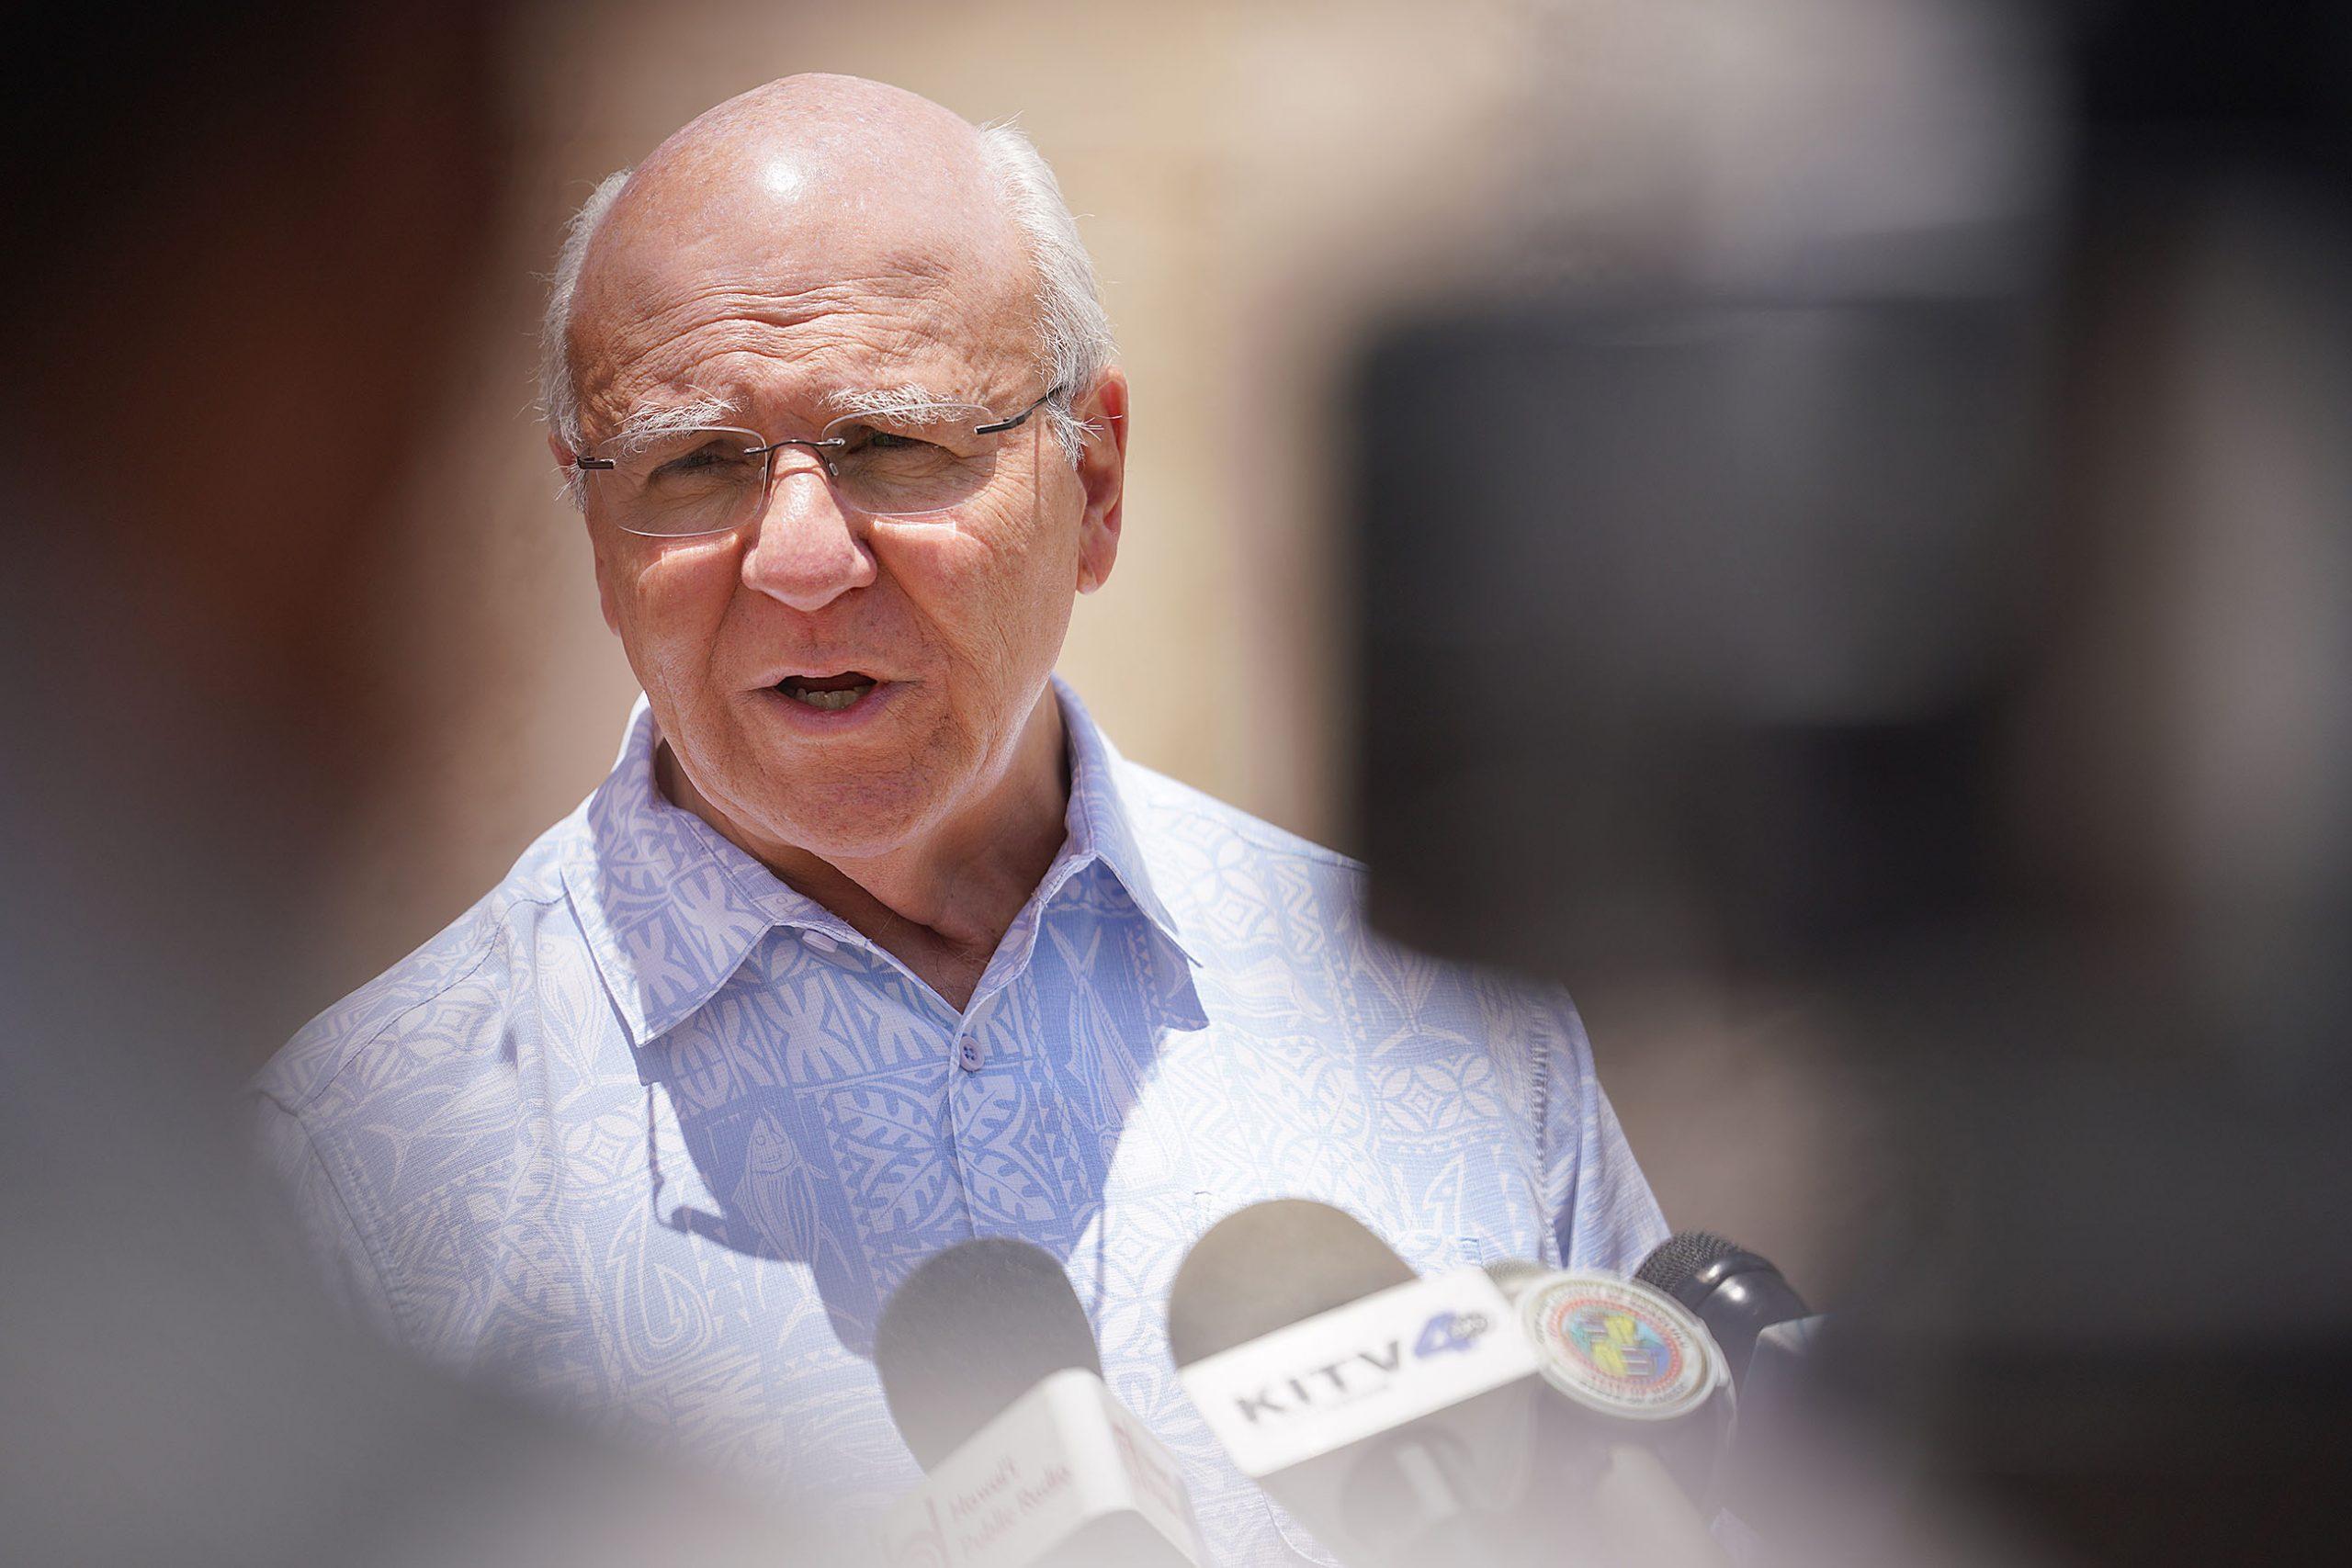 Honolulu Mayor Announces New Restrictions On Social Gatherings